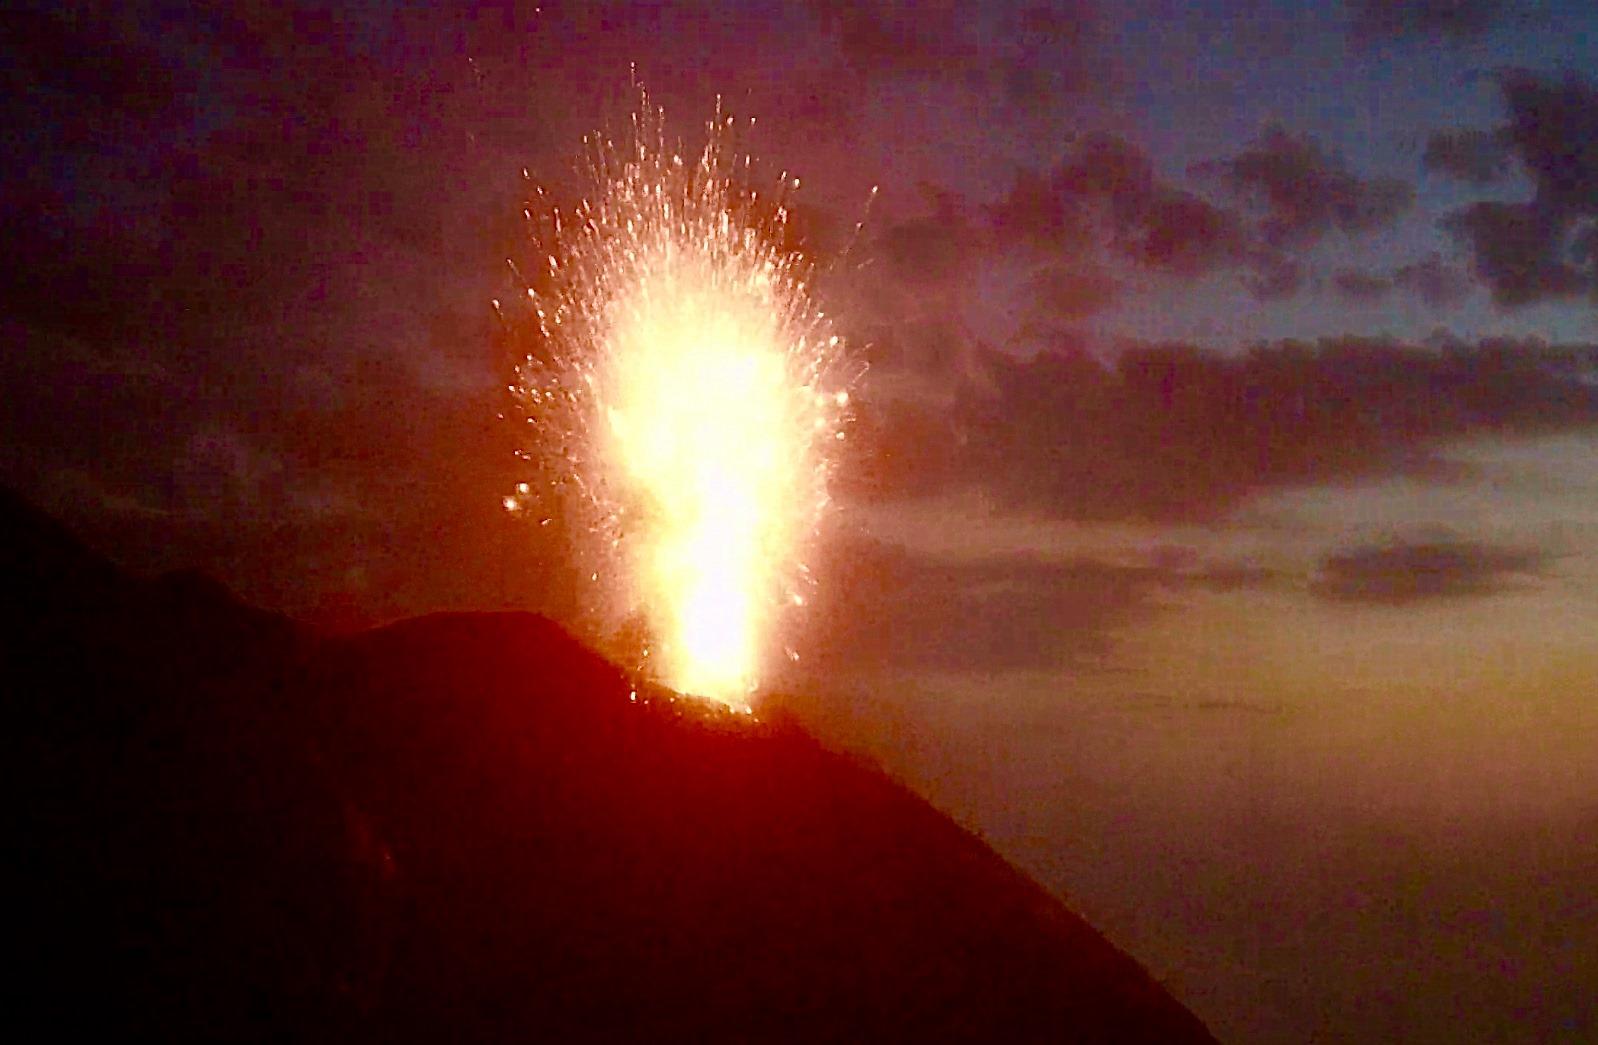 02 Juillet 2020. FR . Italie : Stromboli , La Réunion : Piton de la Fournaise , Etats-Unis : Yellowstone , Chili : Nevados de Chillan , Japon , Nishinoshima .